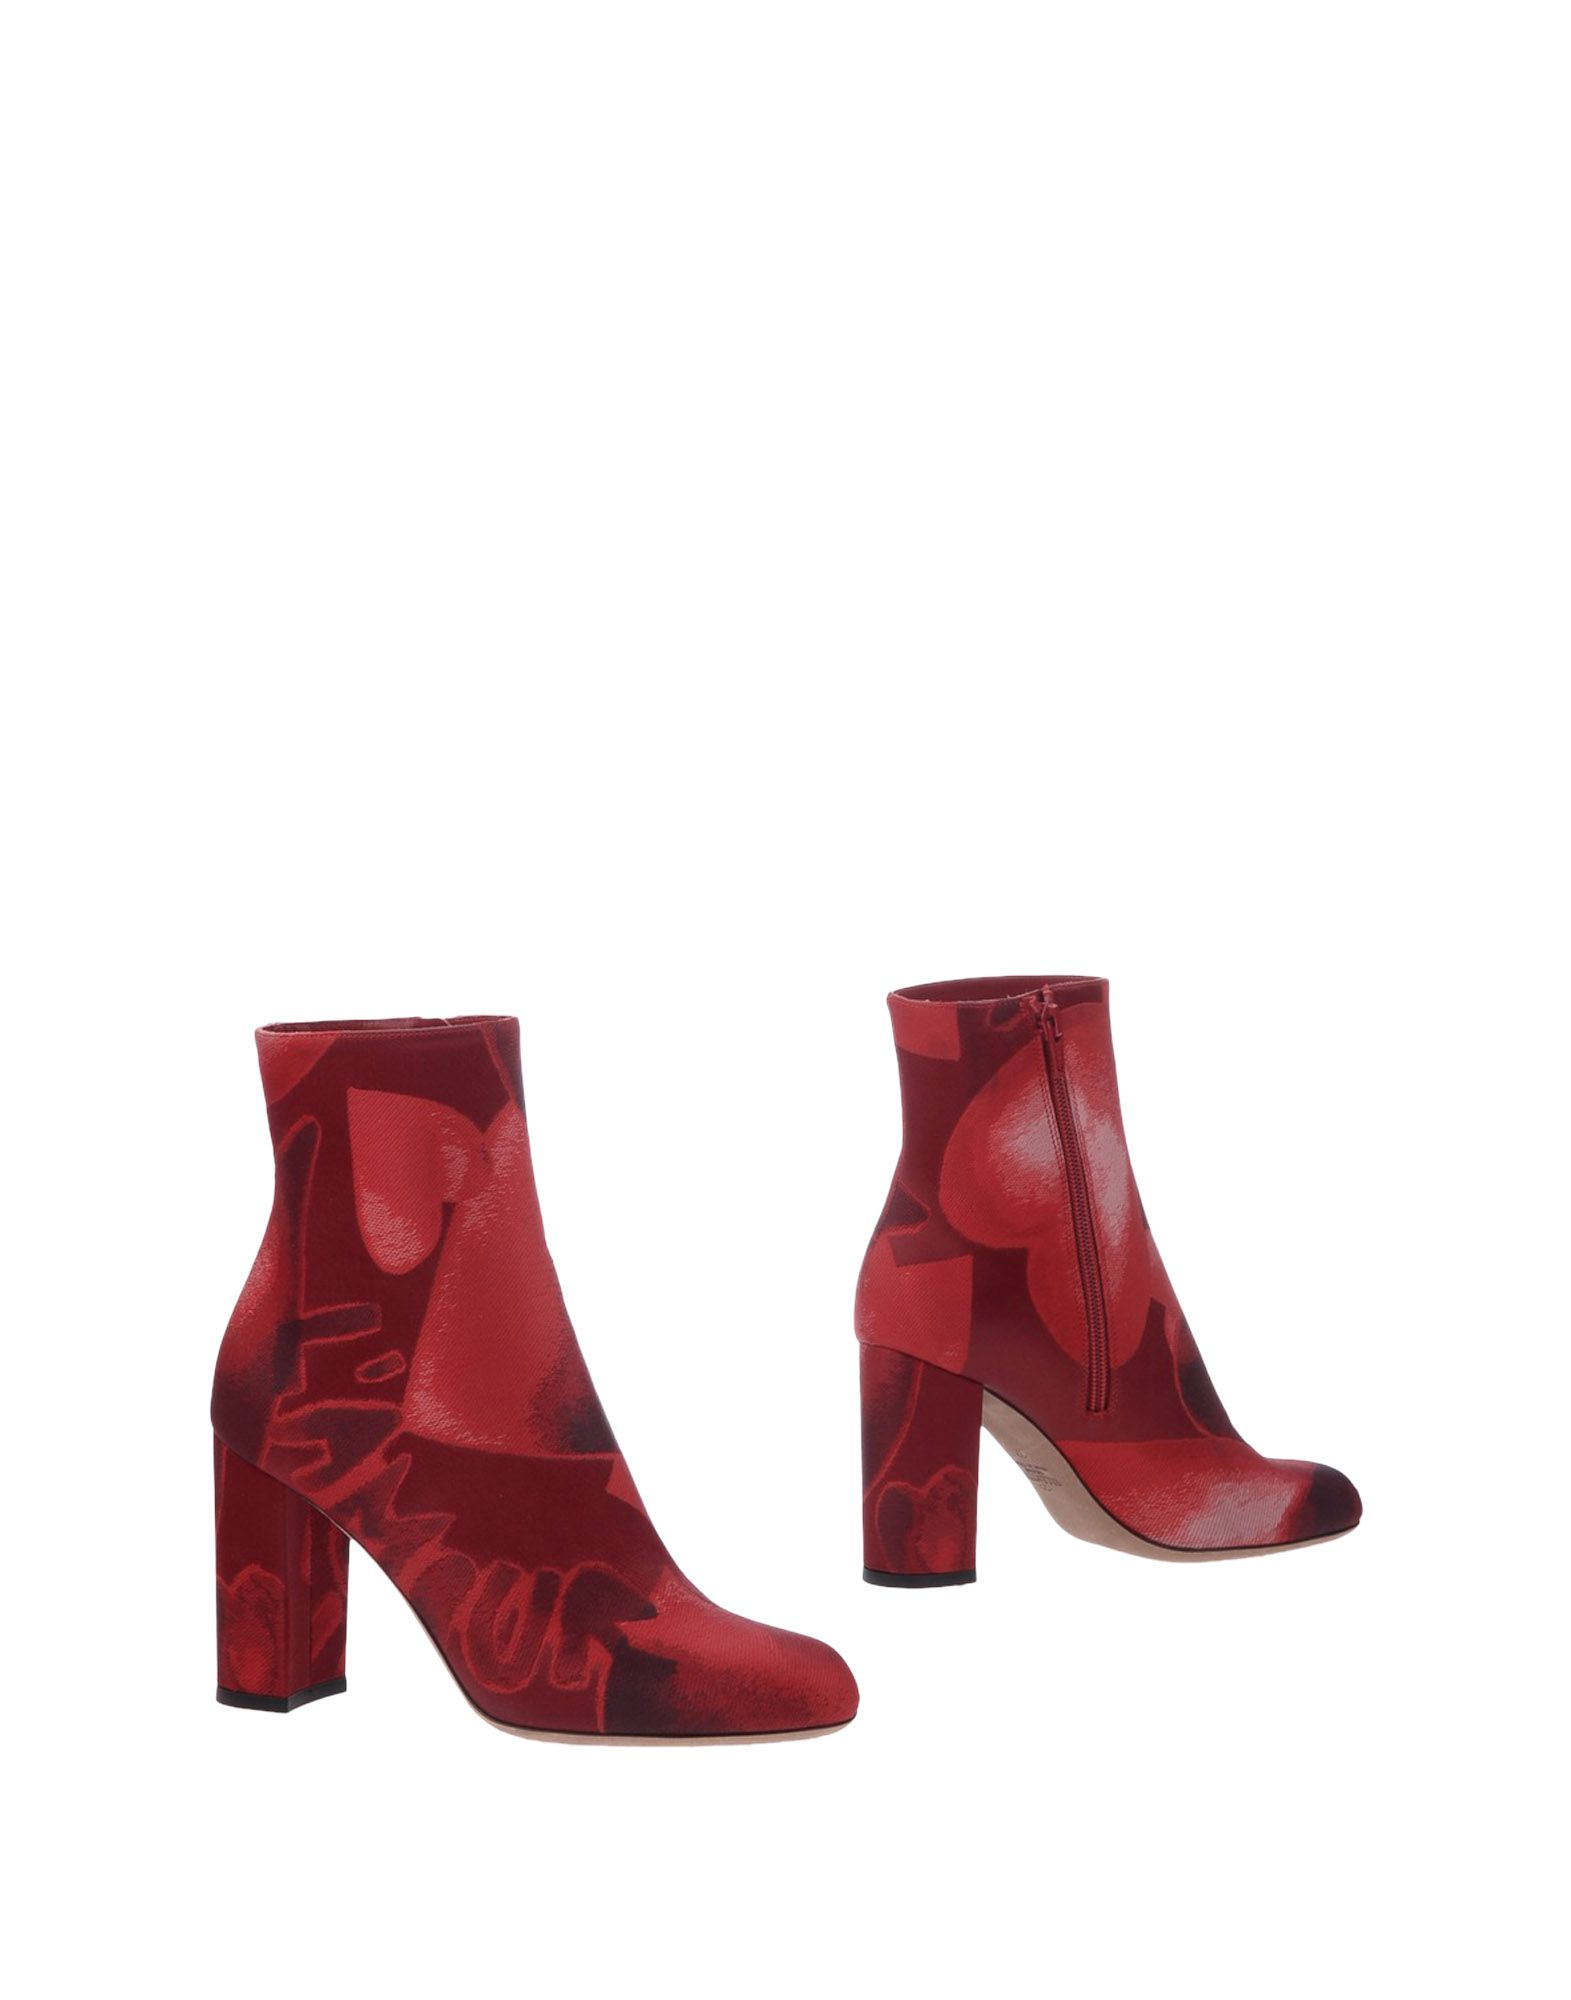 Valentino Garavani Stiefelette Damen Damen Damen  11308541FP Neue Schuhe 471d54